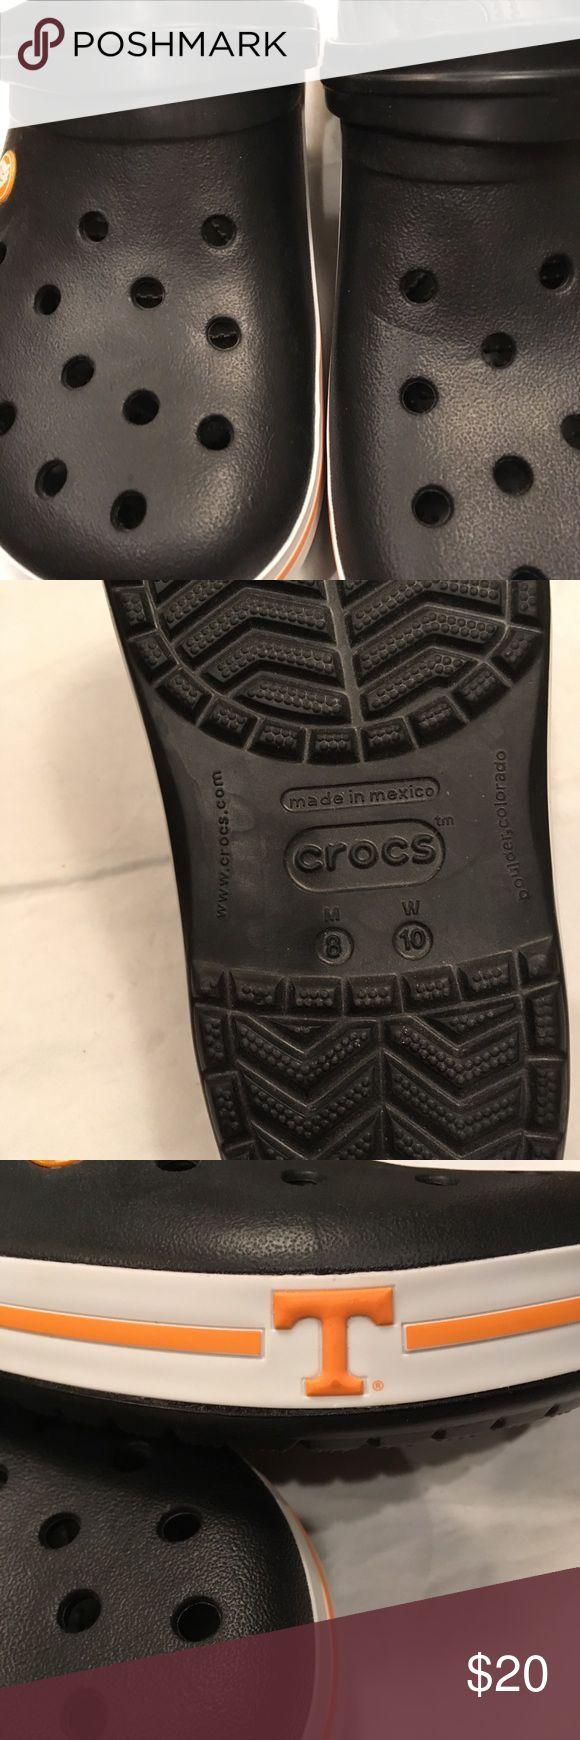 NWOT Crocs mens 8 women's 10 University of TN New no tags CROCS Shoes Slippers